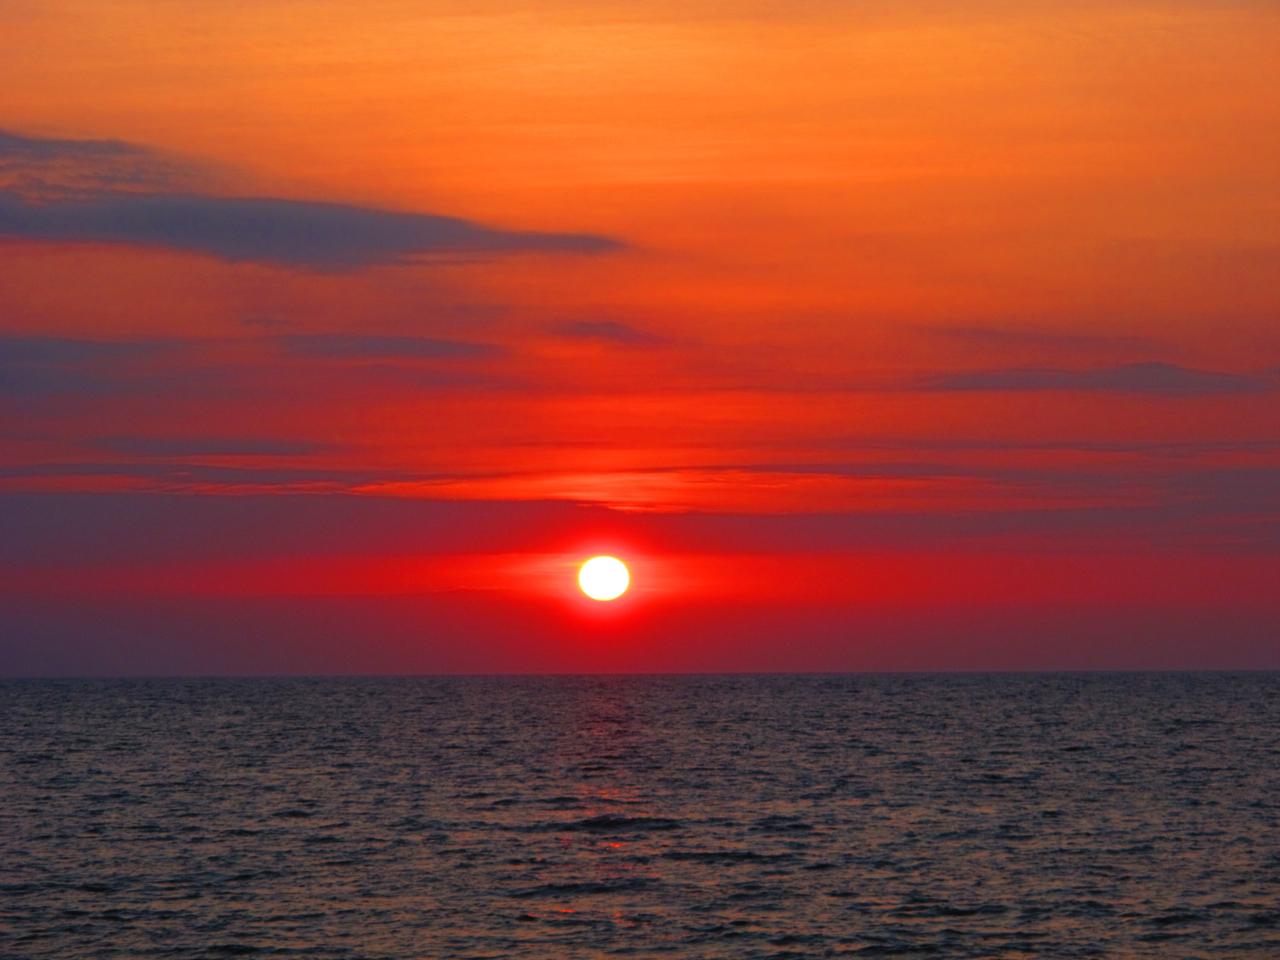 Beeindruckende Szenerie zum Sonnenuntergang am Lovina Beach in Nordbali.